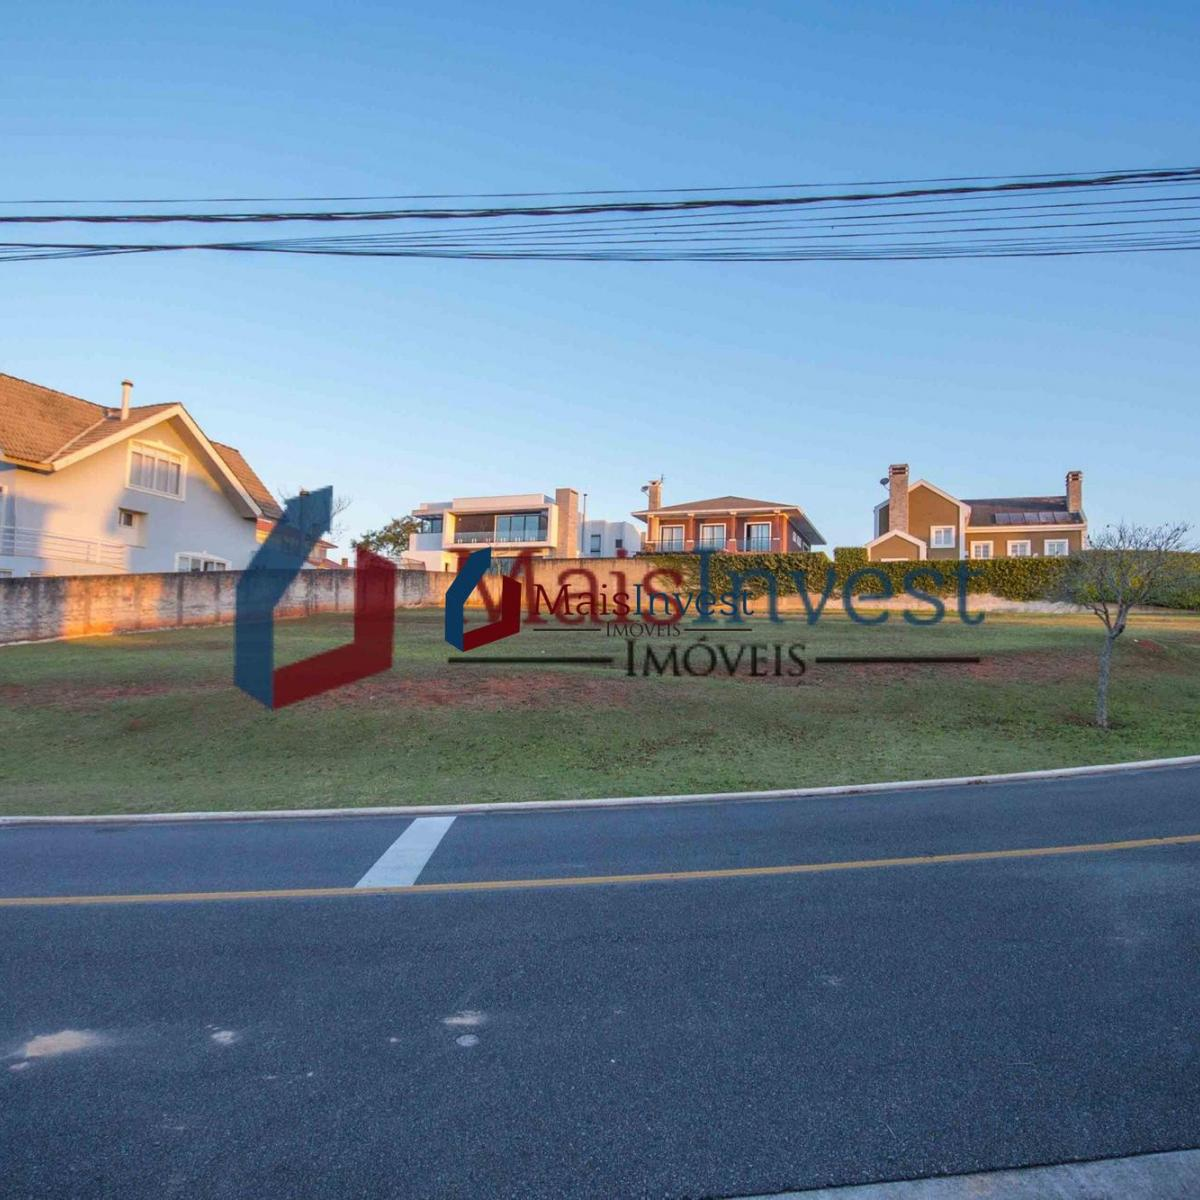 http://www.infocenterhost2.com.br/crm/fotosimovel/506101/110683760-terreno-em-condominio-pinhais-alphaville-graciosa.jpg